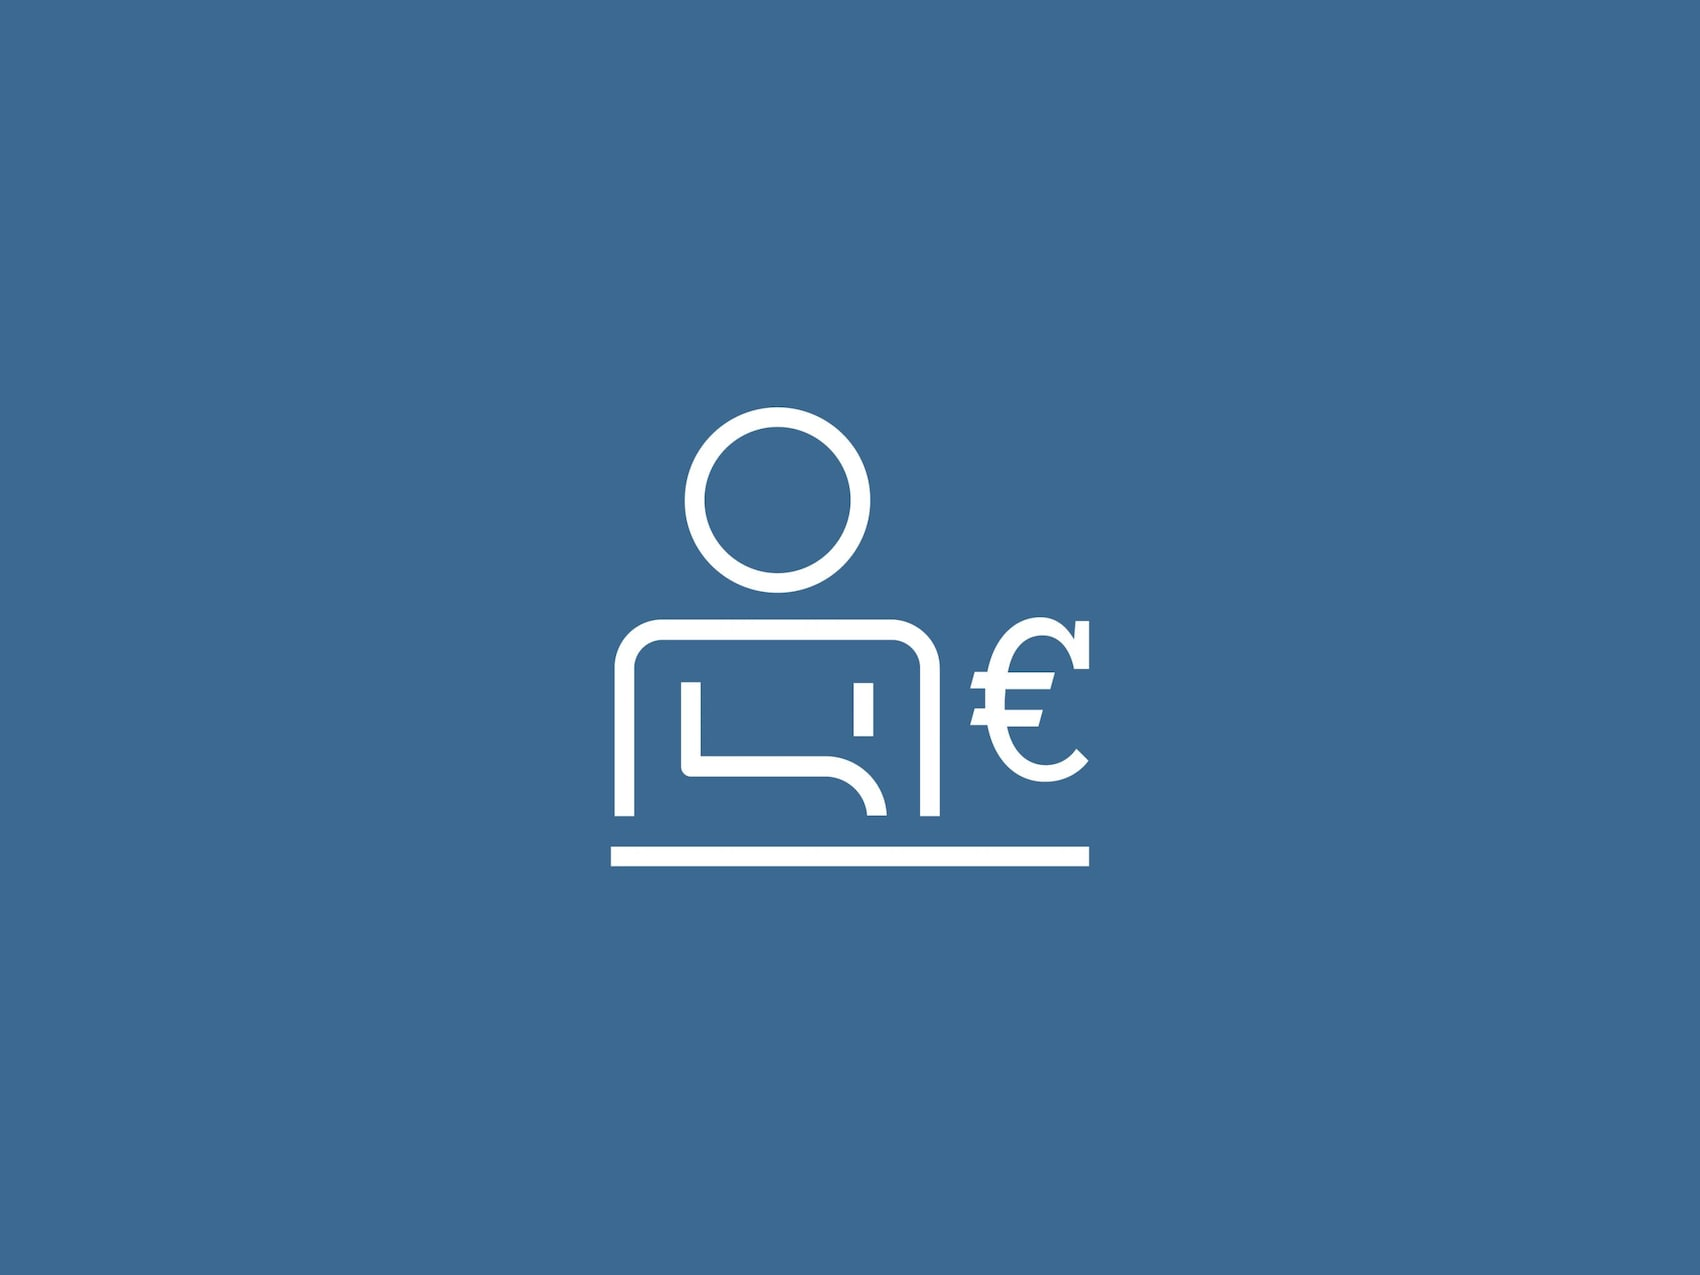 Geschäftskunden smart fleetshare LS  Integrierte Bezahlfunktion